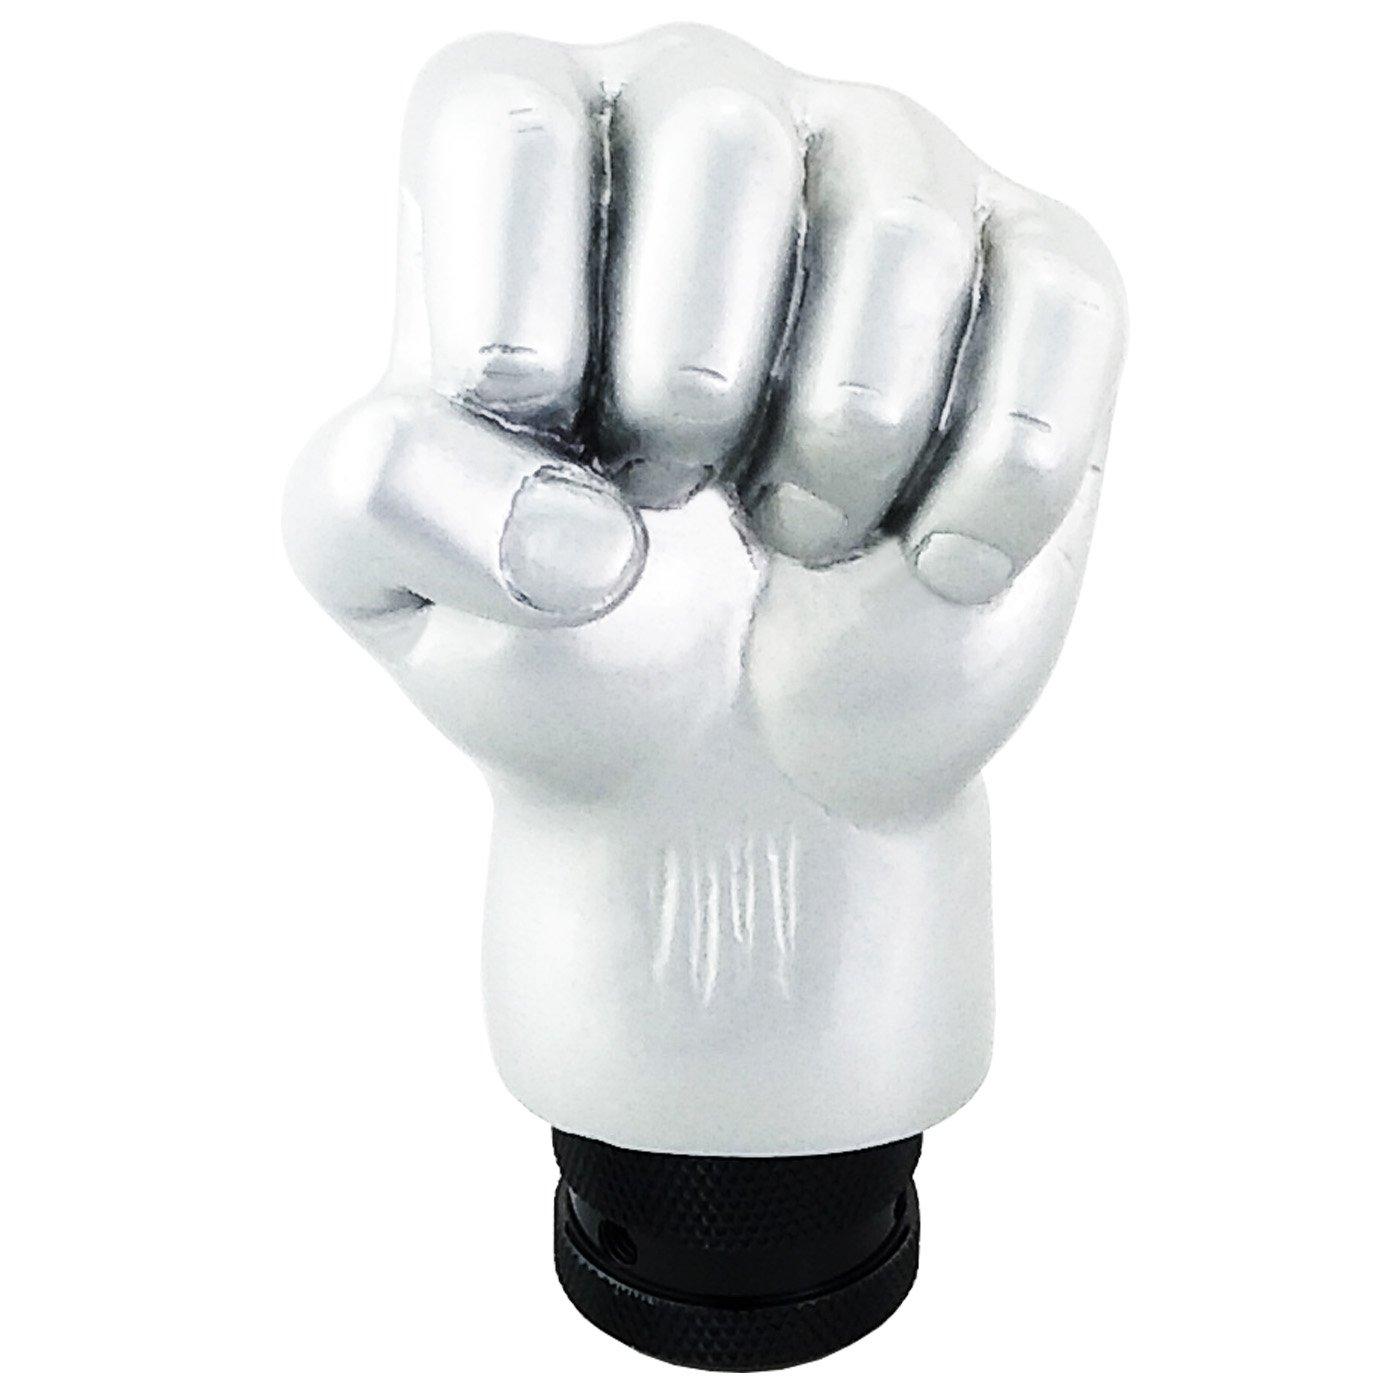 Lensuntom LUNSOM Manual Automatic Transmission Silver Hand Universal Shift Knob Aluminium Alloy Knobs Shifter Gear Stick Head